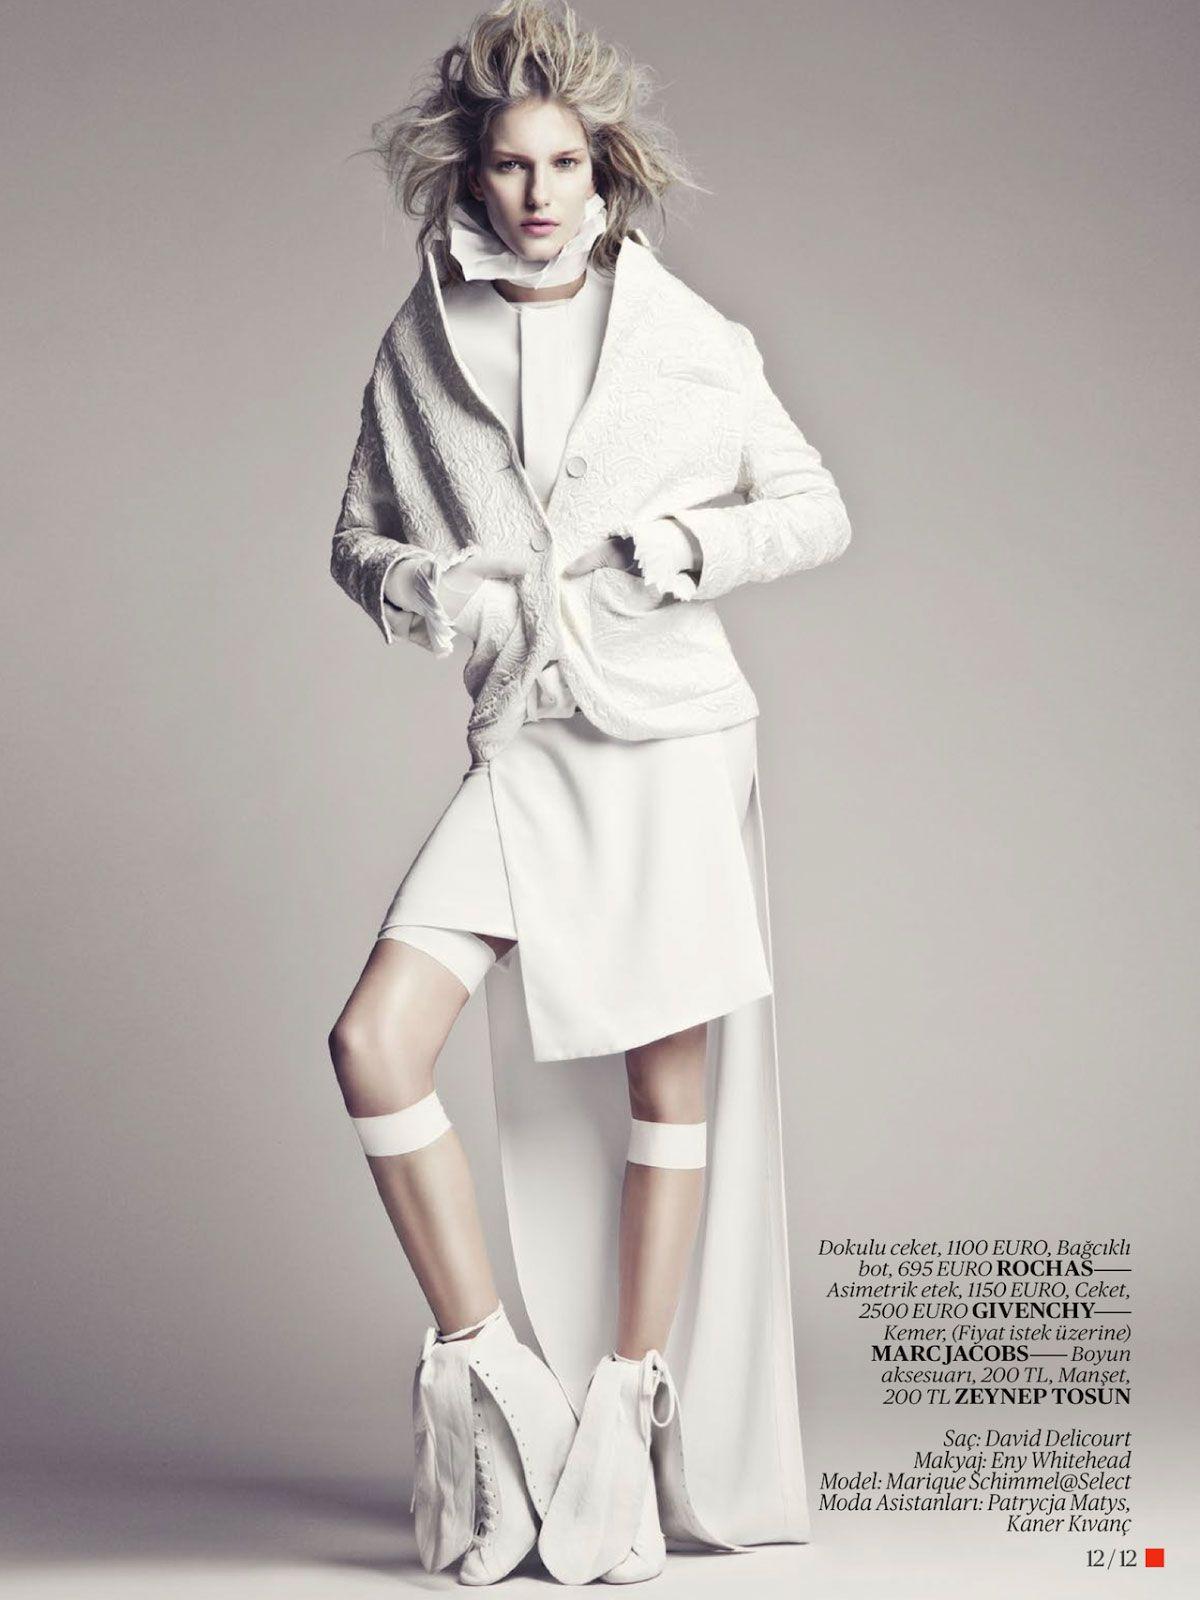 Pin by ZLB on Fashion // white!!! | Editorial fashion ...